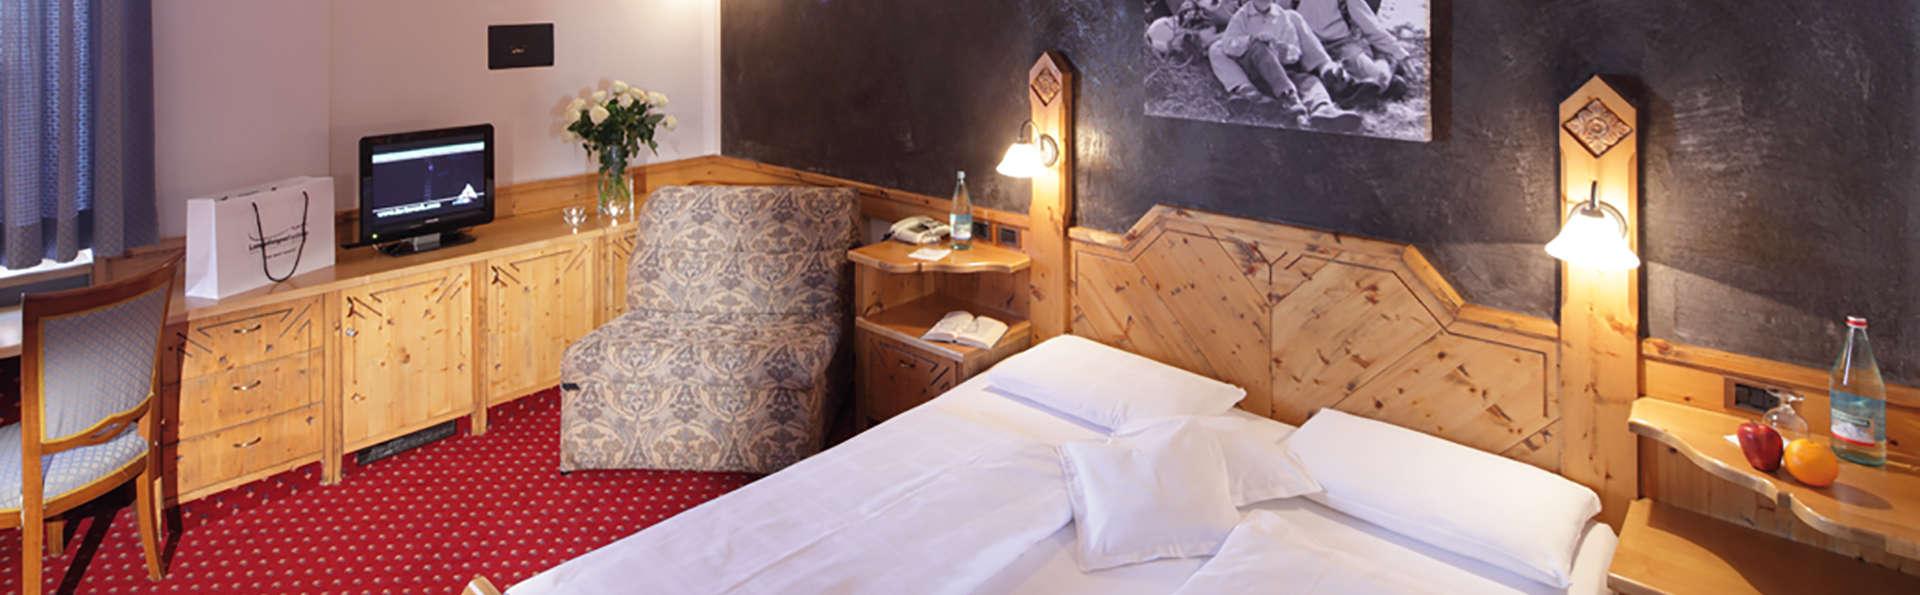 Hotel Concordia - edit_room_standard.jpg